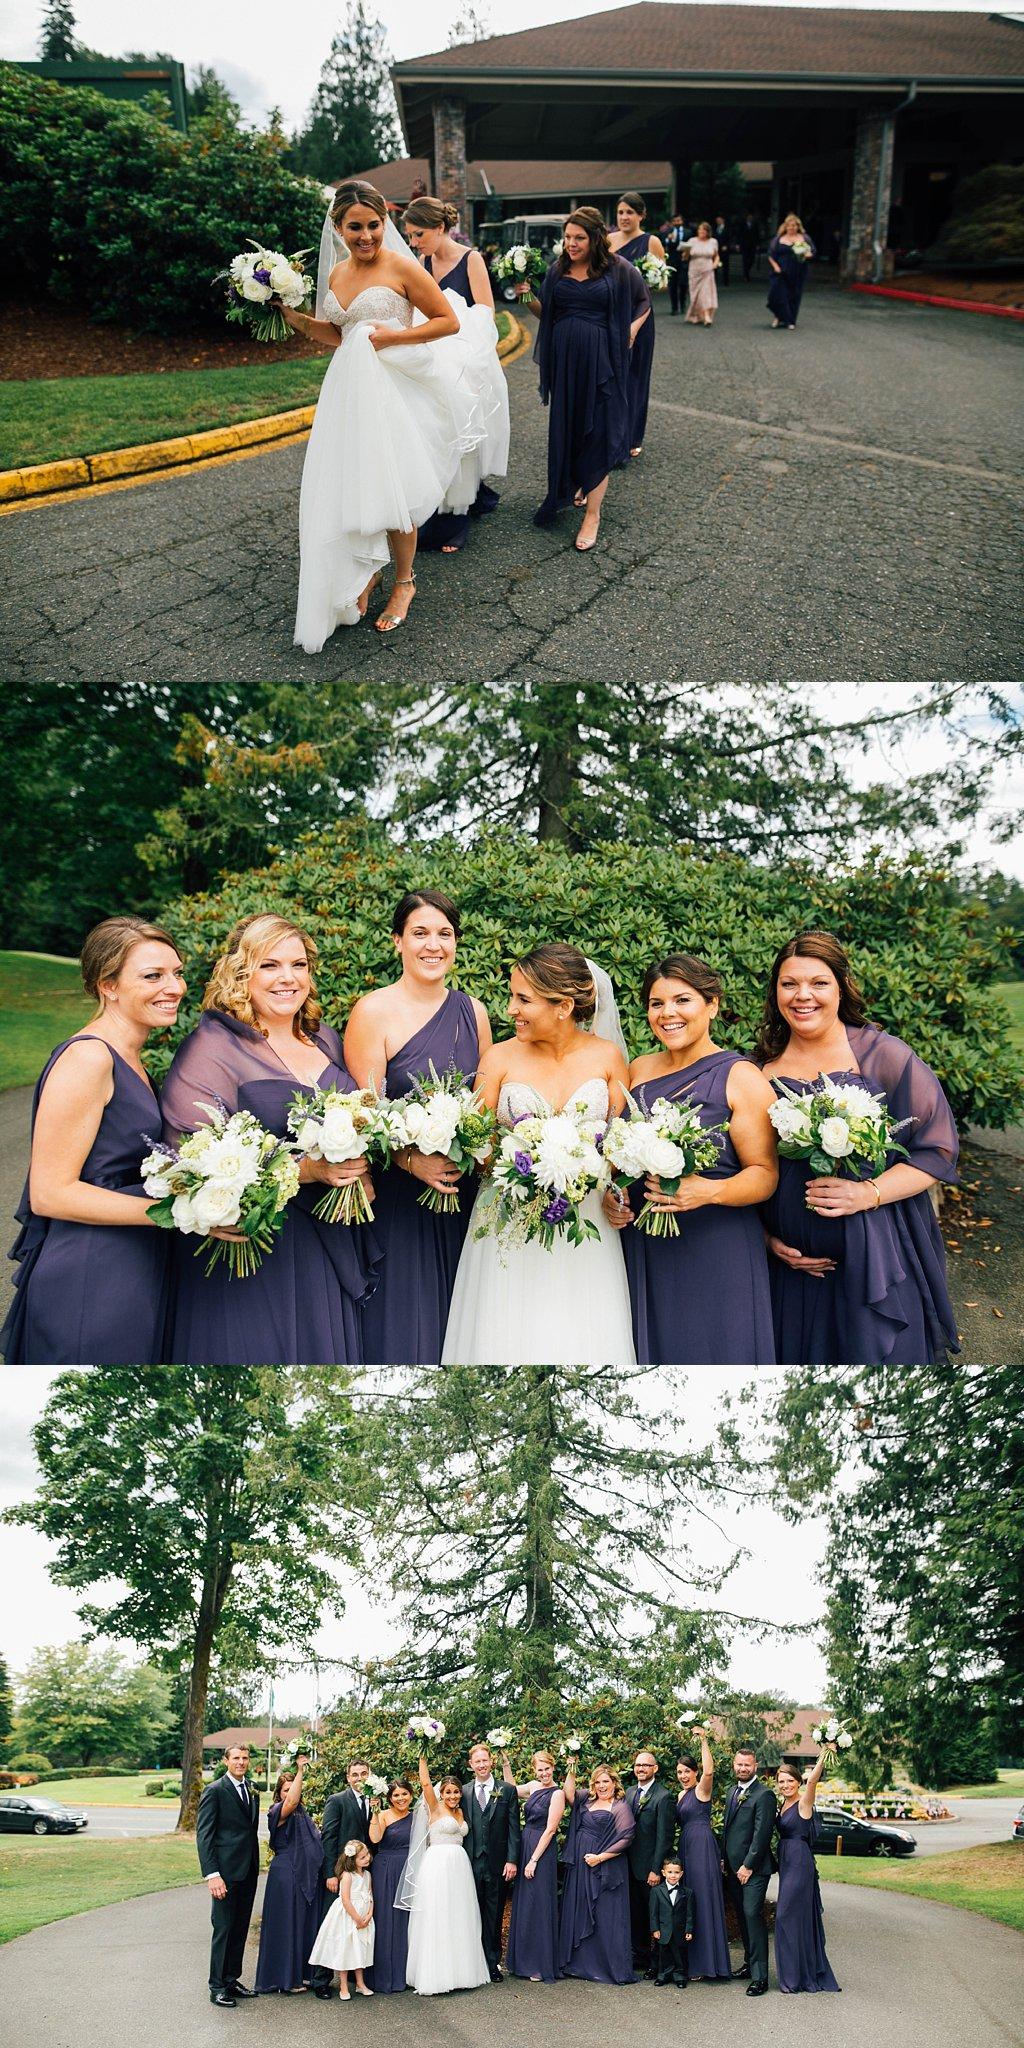 ashley_vos_seattle_wedding_photographer_0094.jpg